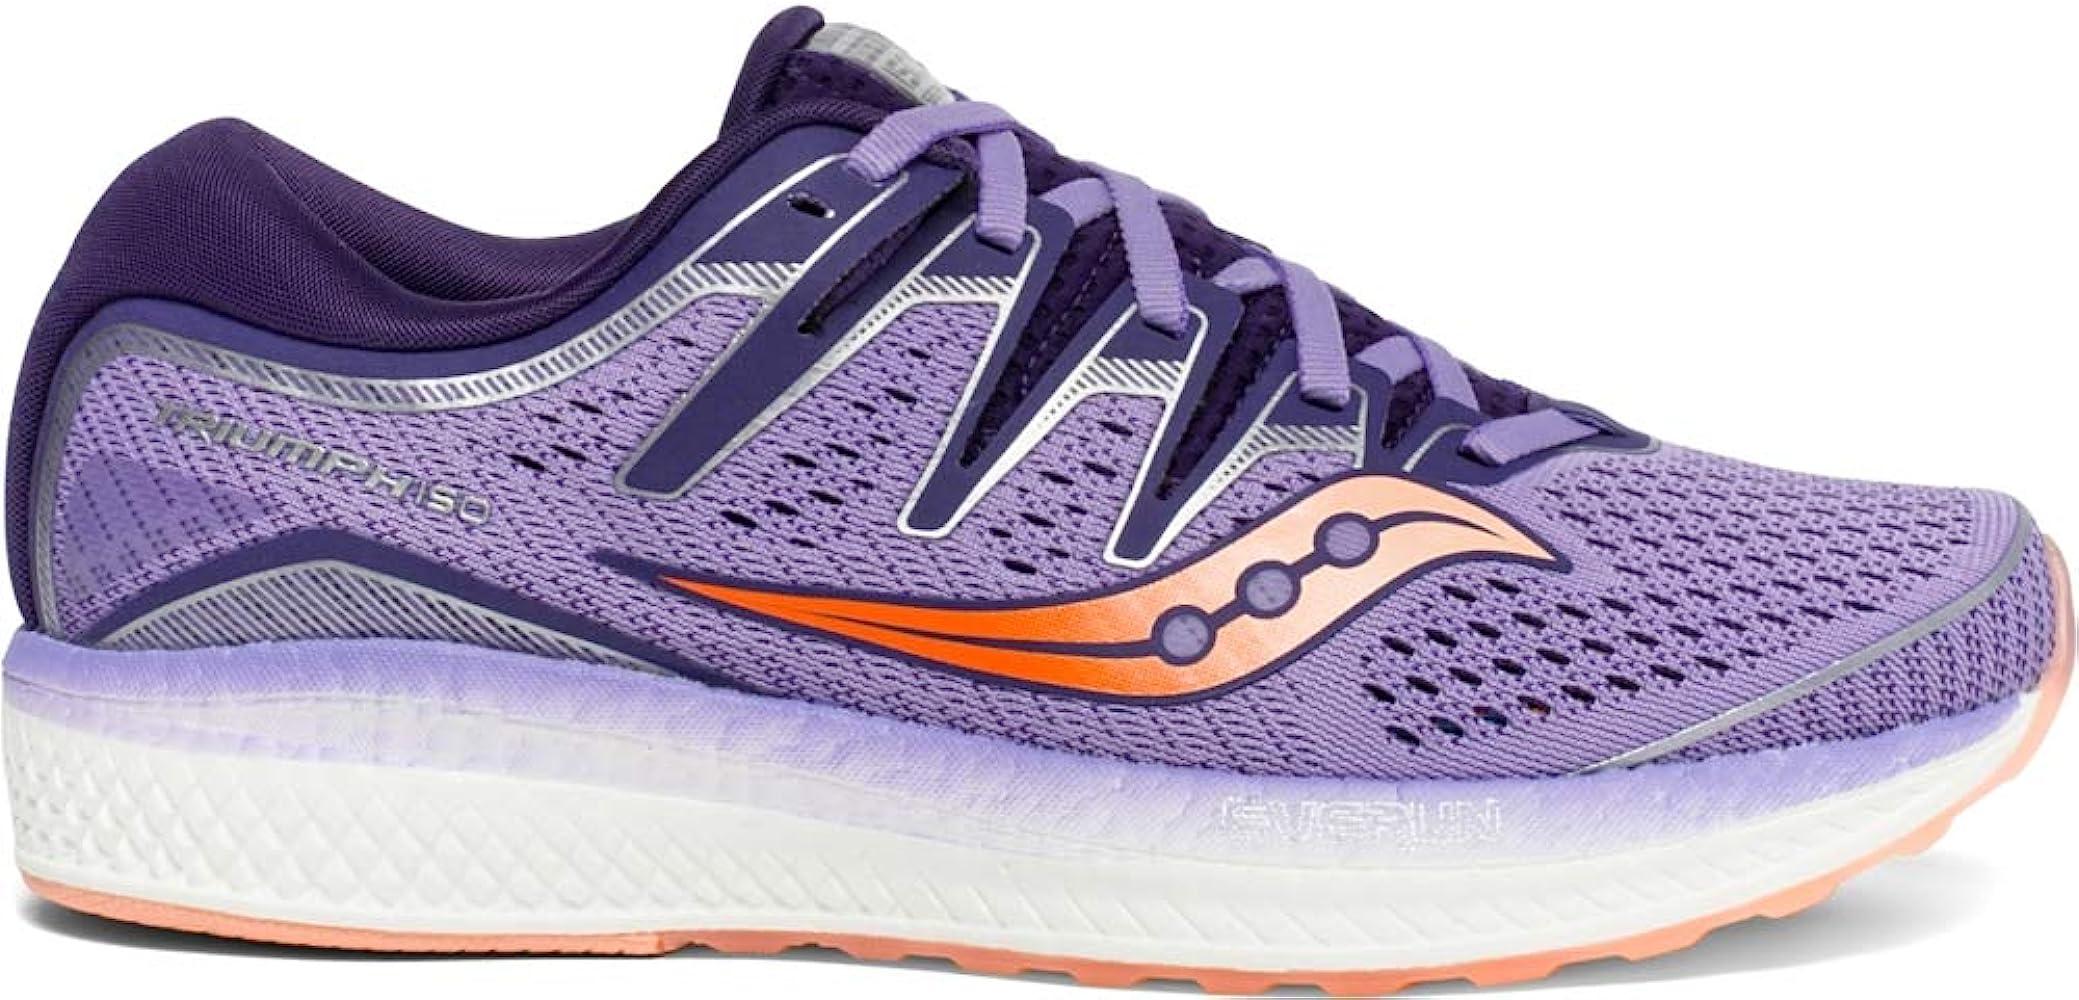 Women's Triumph ISO 5 Running Shoe, PurplePeach, 9.5 M US